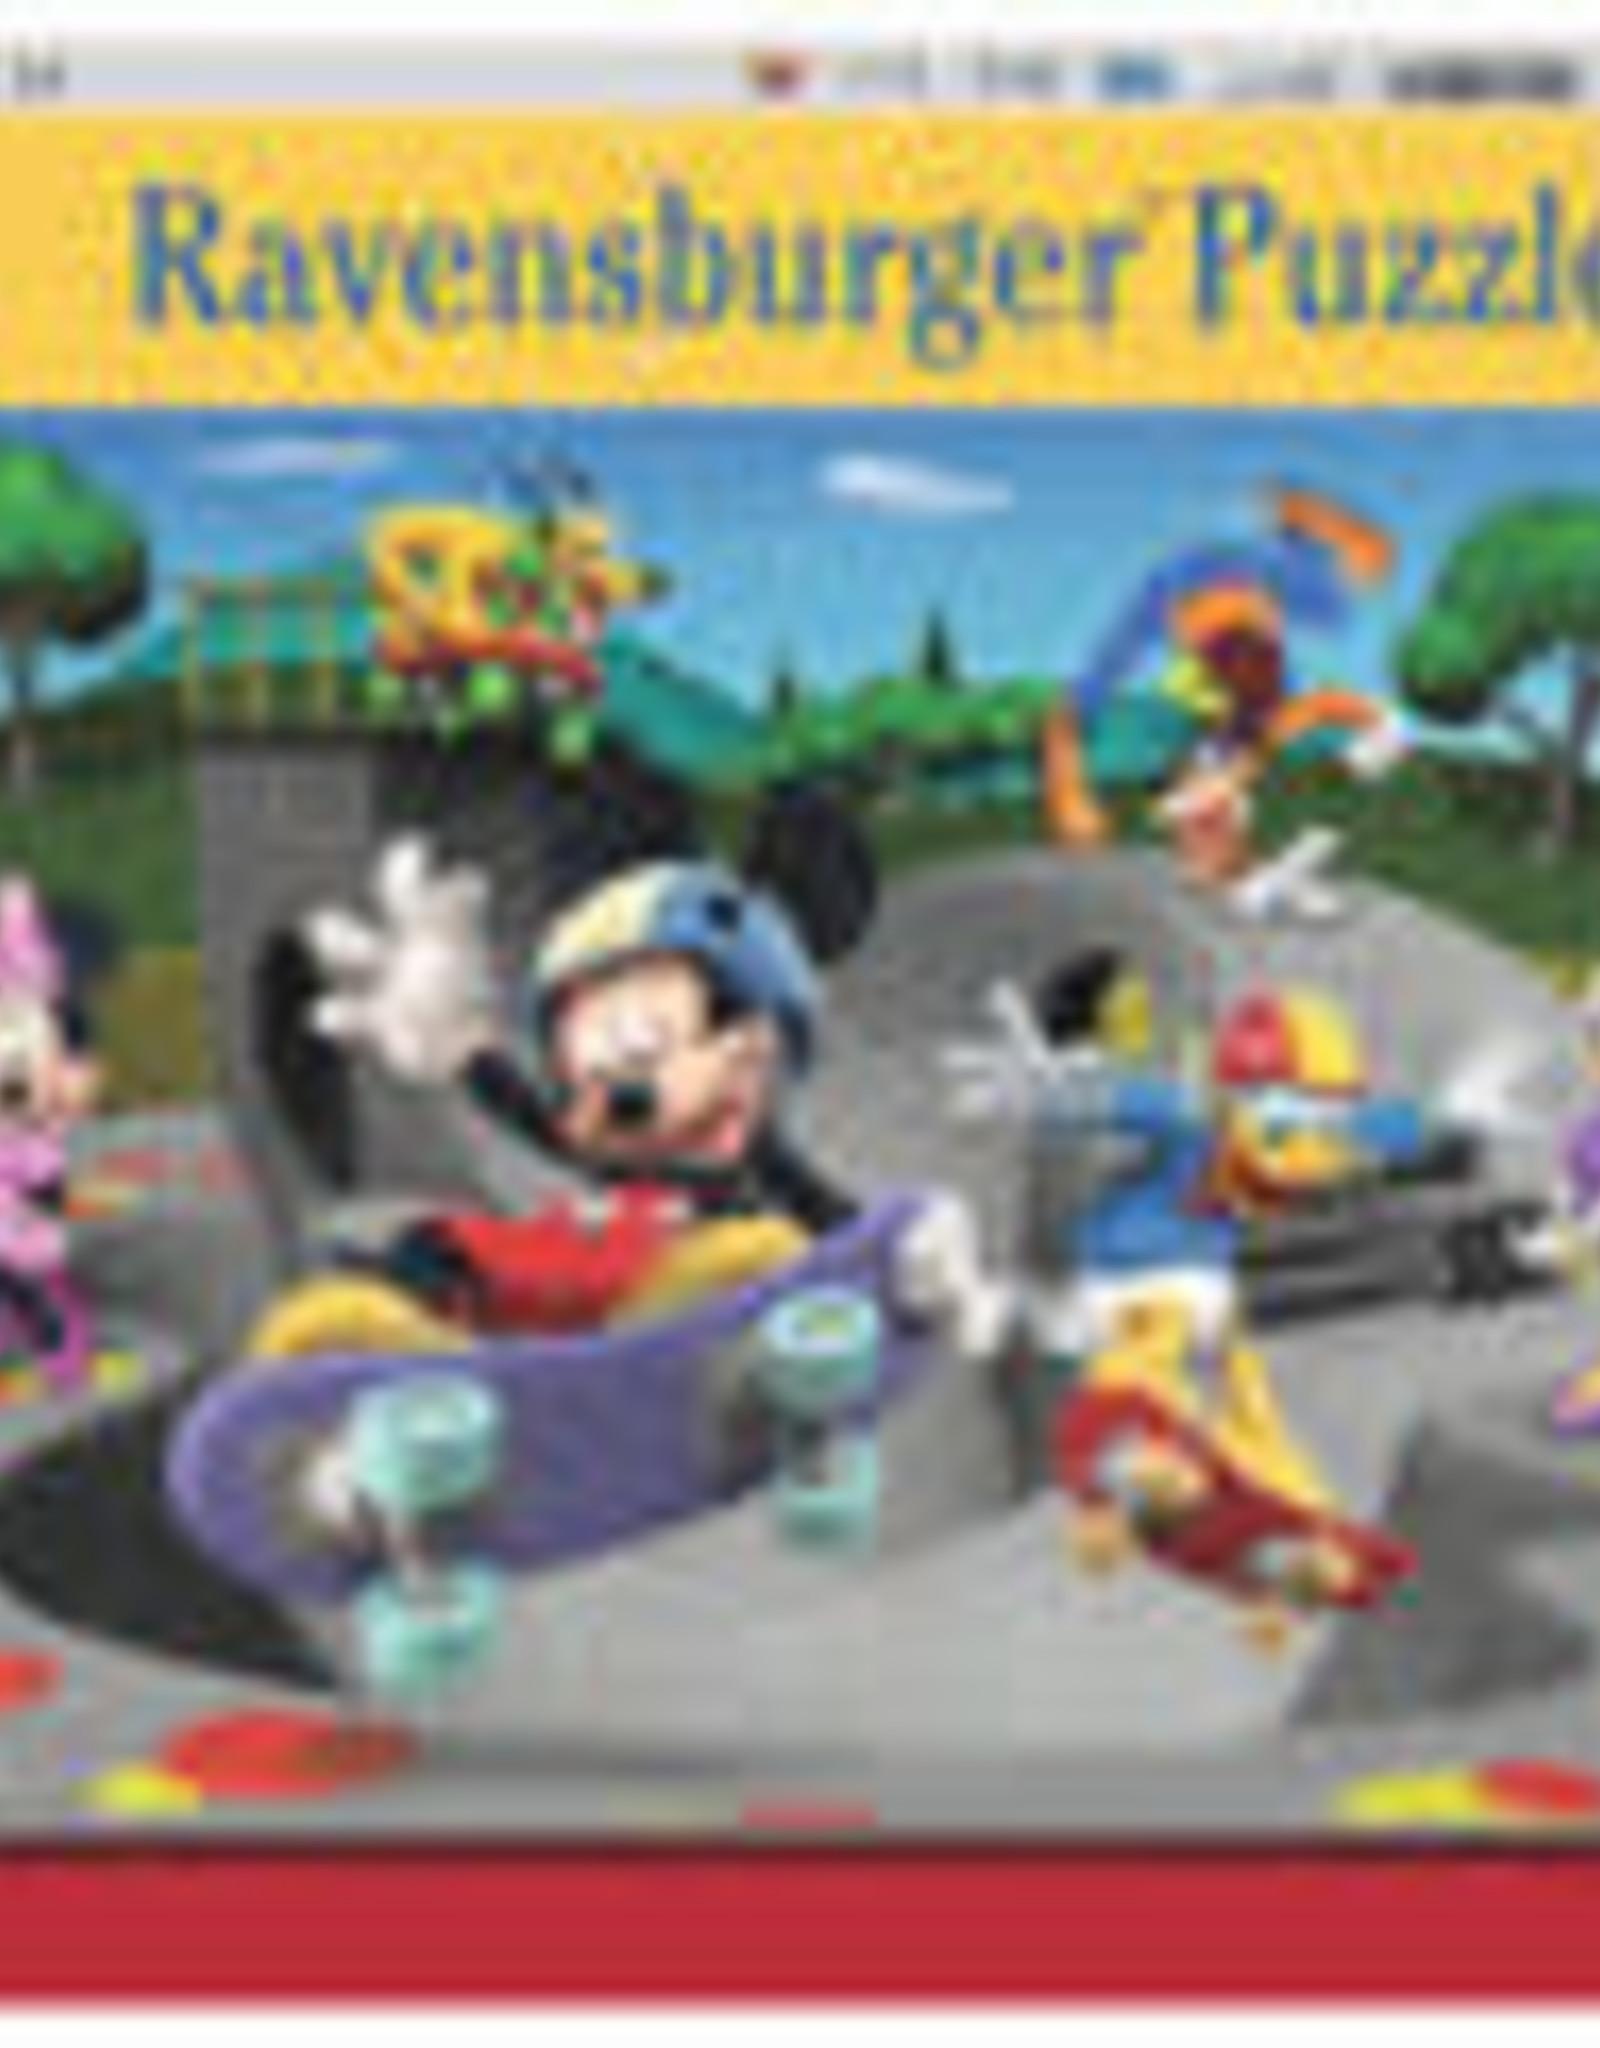 Ravensburger At the Skate Park 100 pc Puzzle